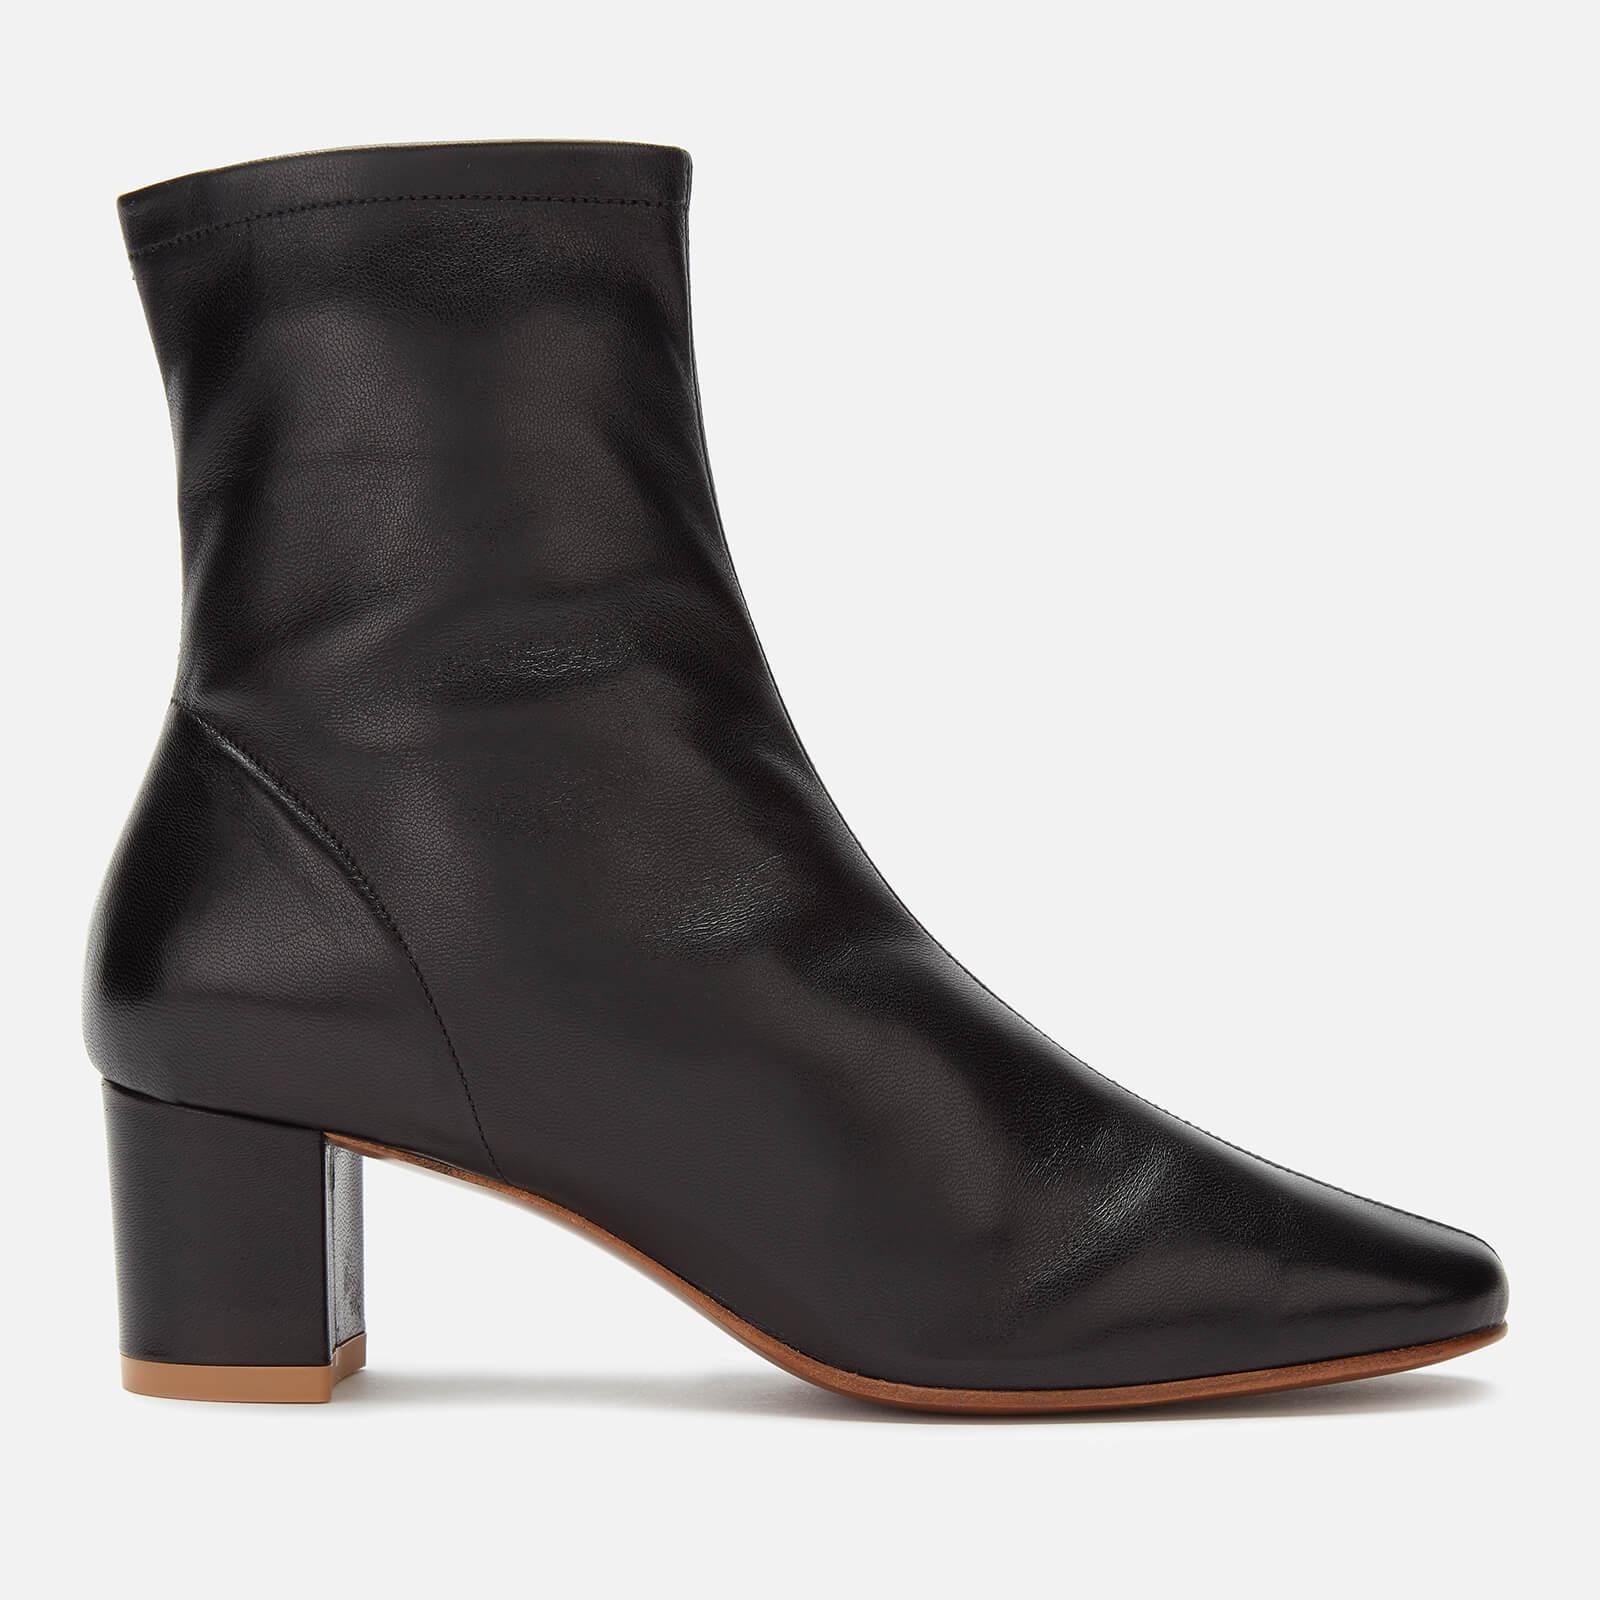 BY FAR Women's Sofia Leather Heeled Boots - Black - UK 7 - Black